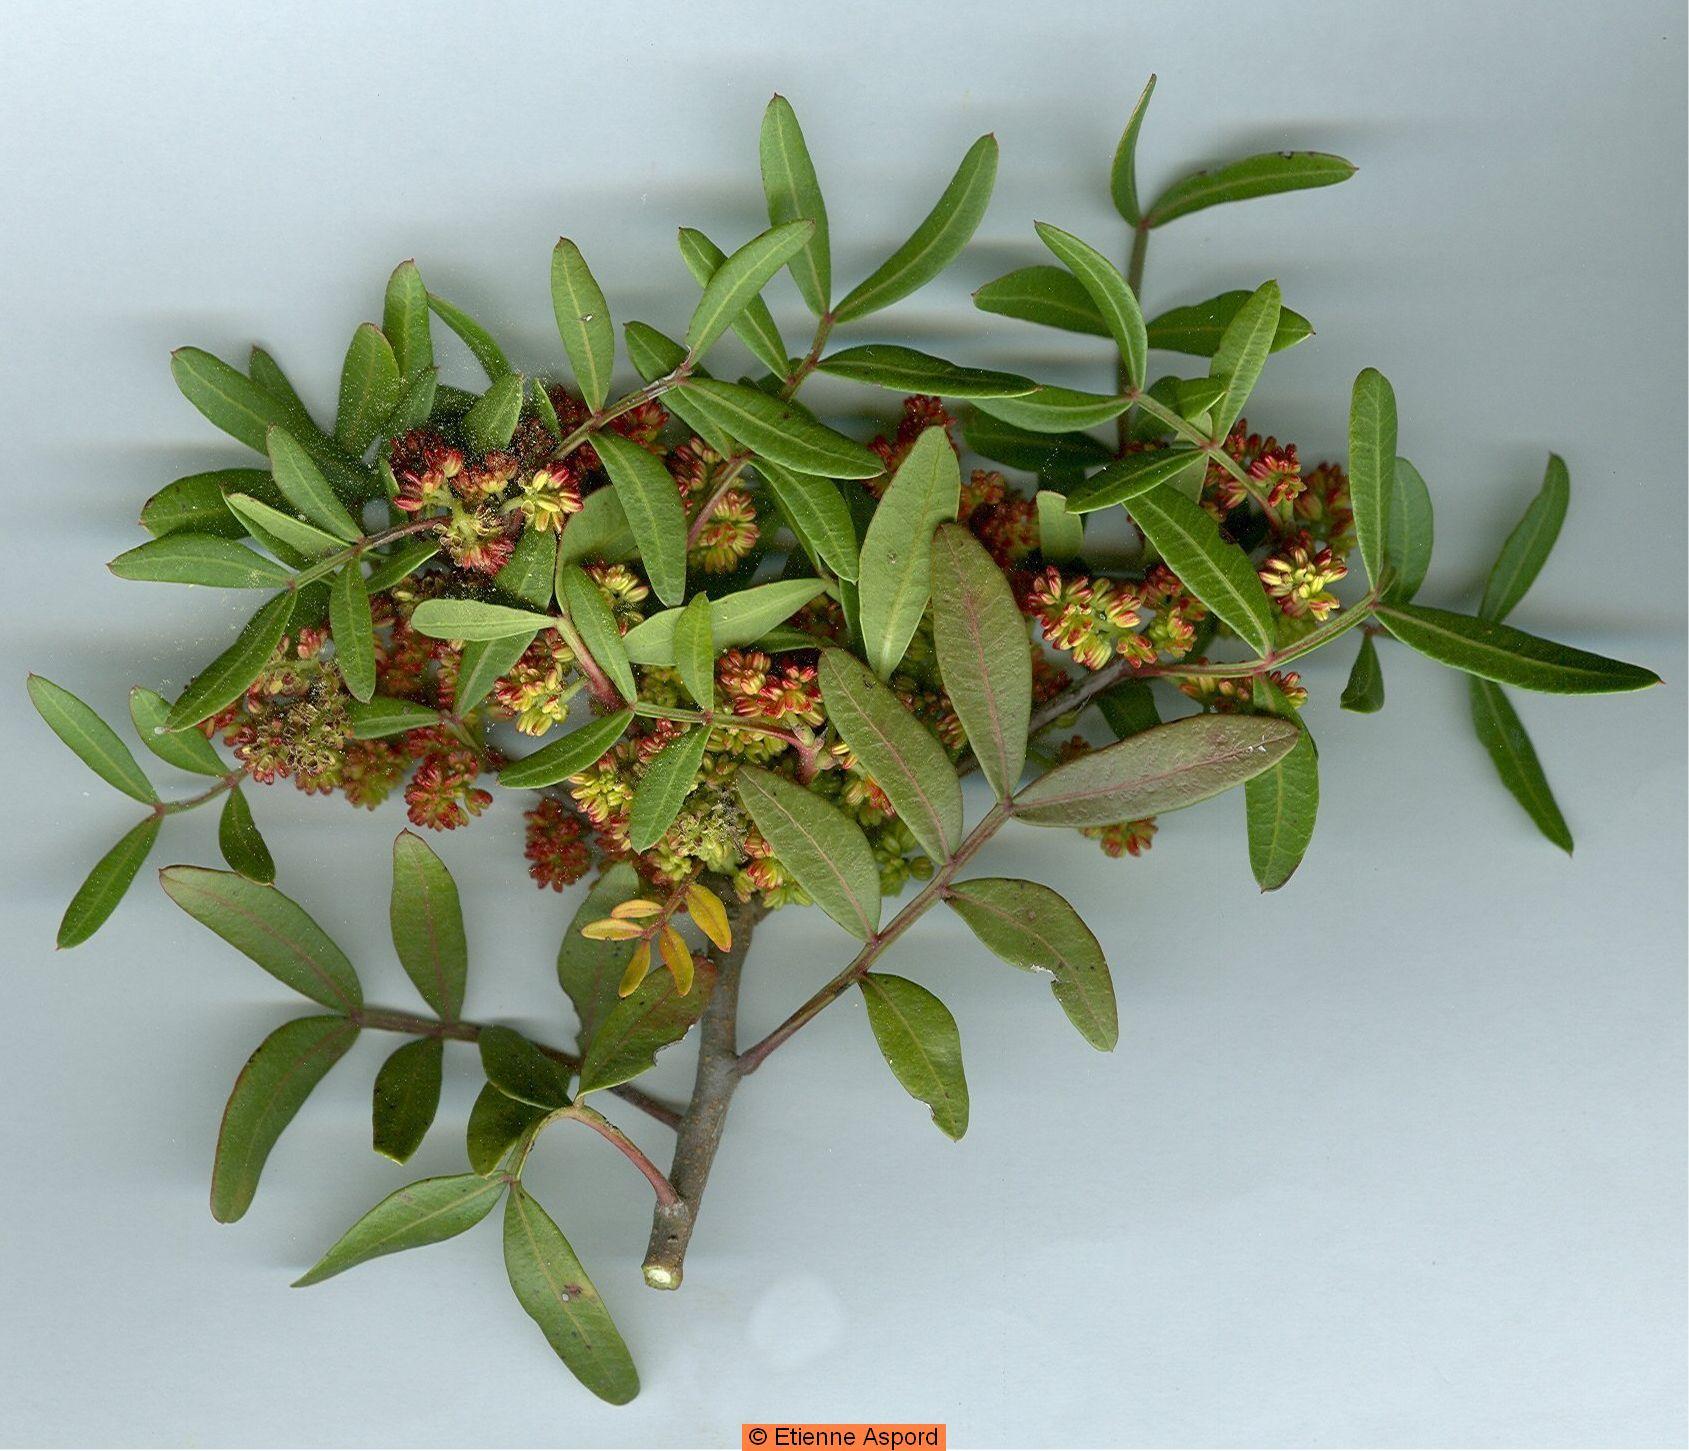 pistacia lentiscus l 13009 marseille vallon des escoutines 2009 04 28 avr. Black Bedroom Furniture Sets. Home Design Ideas